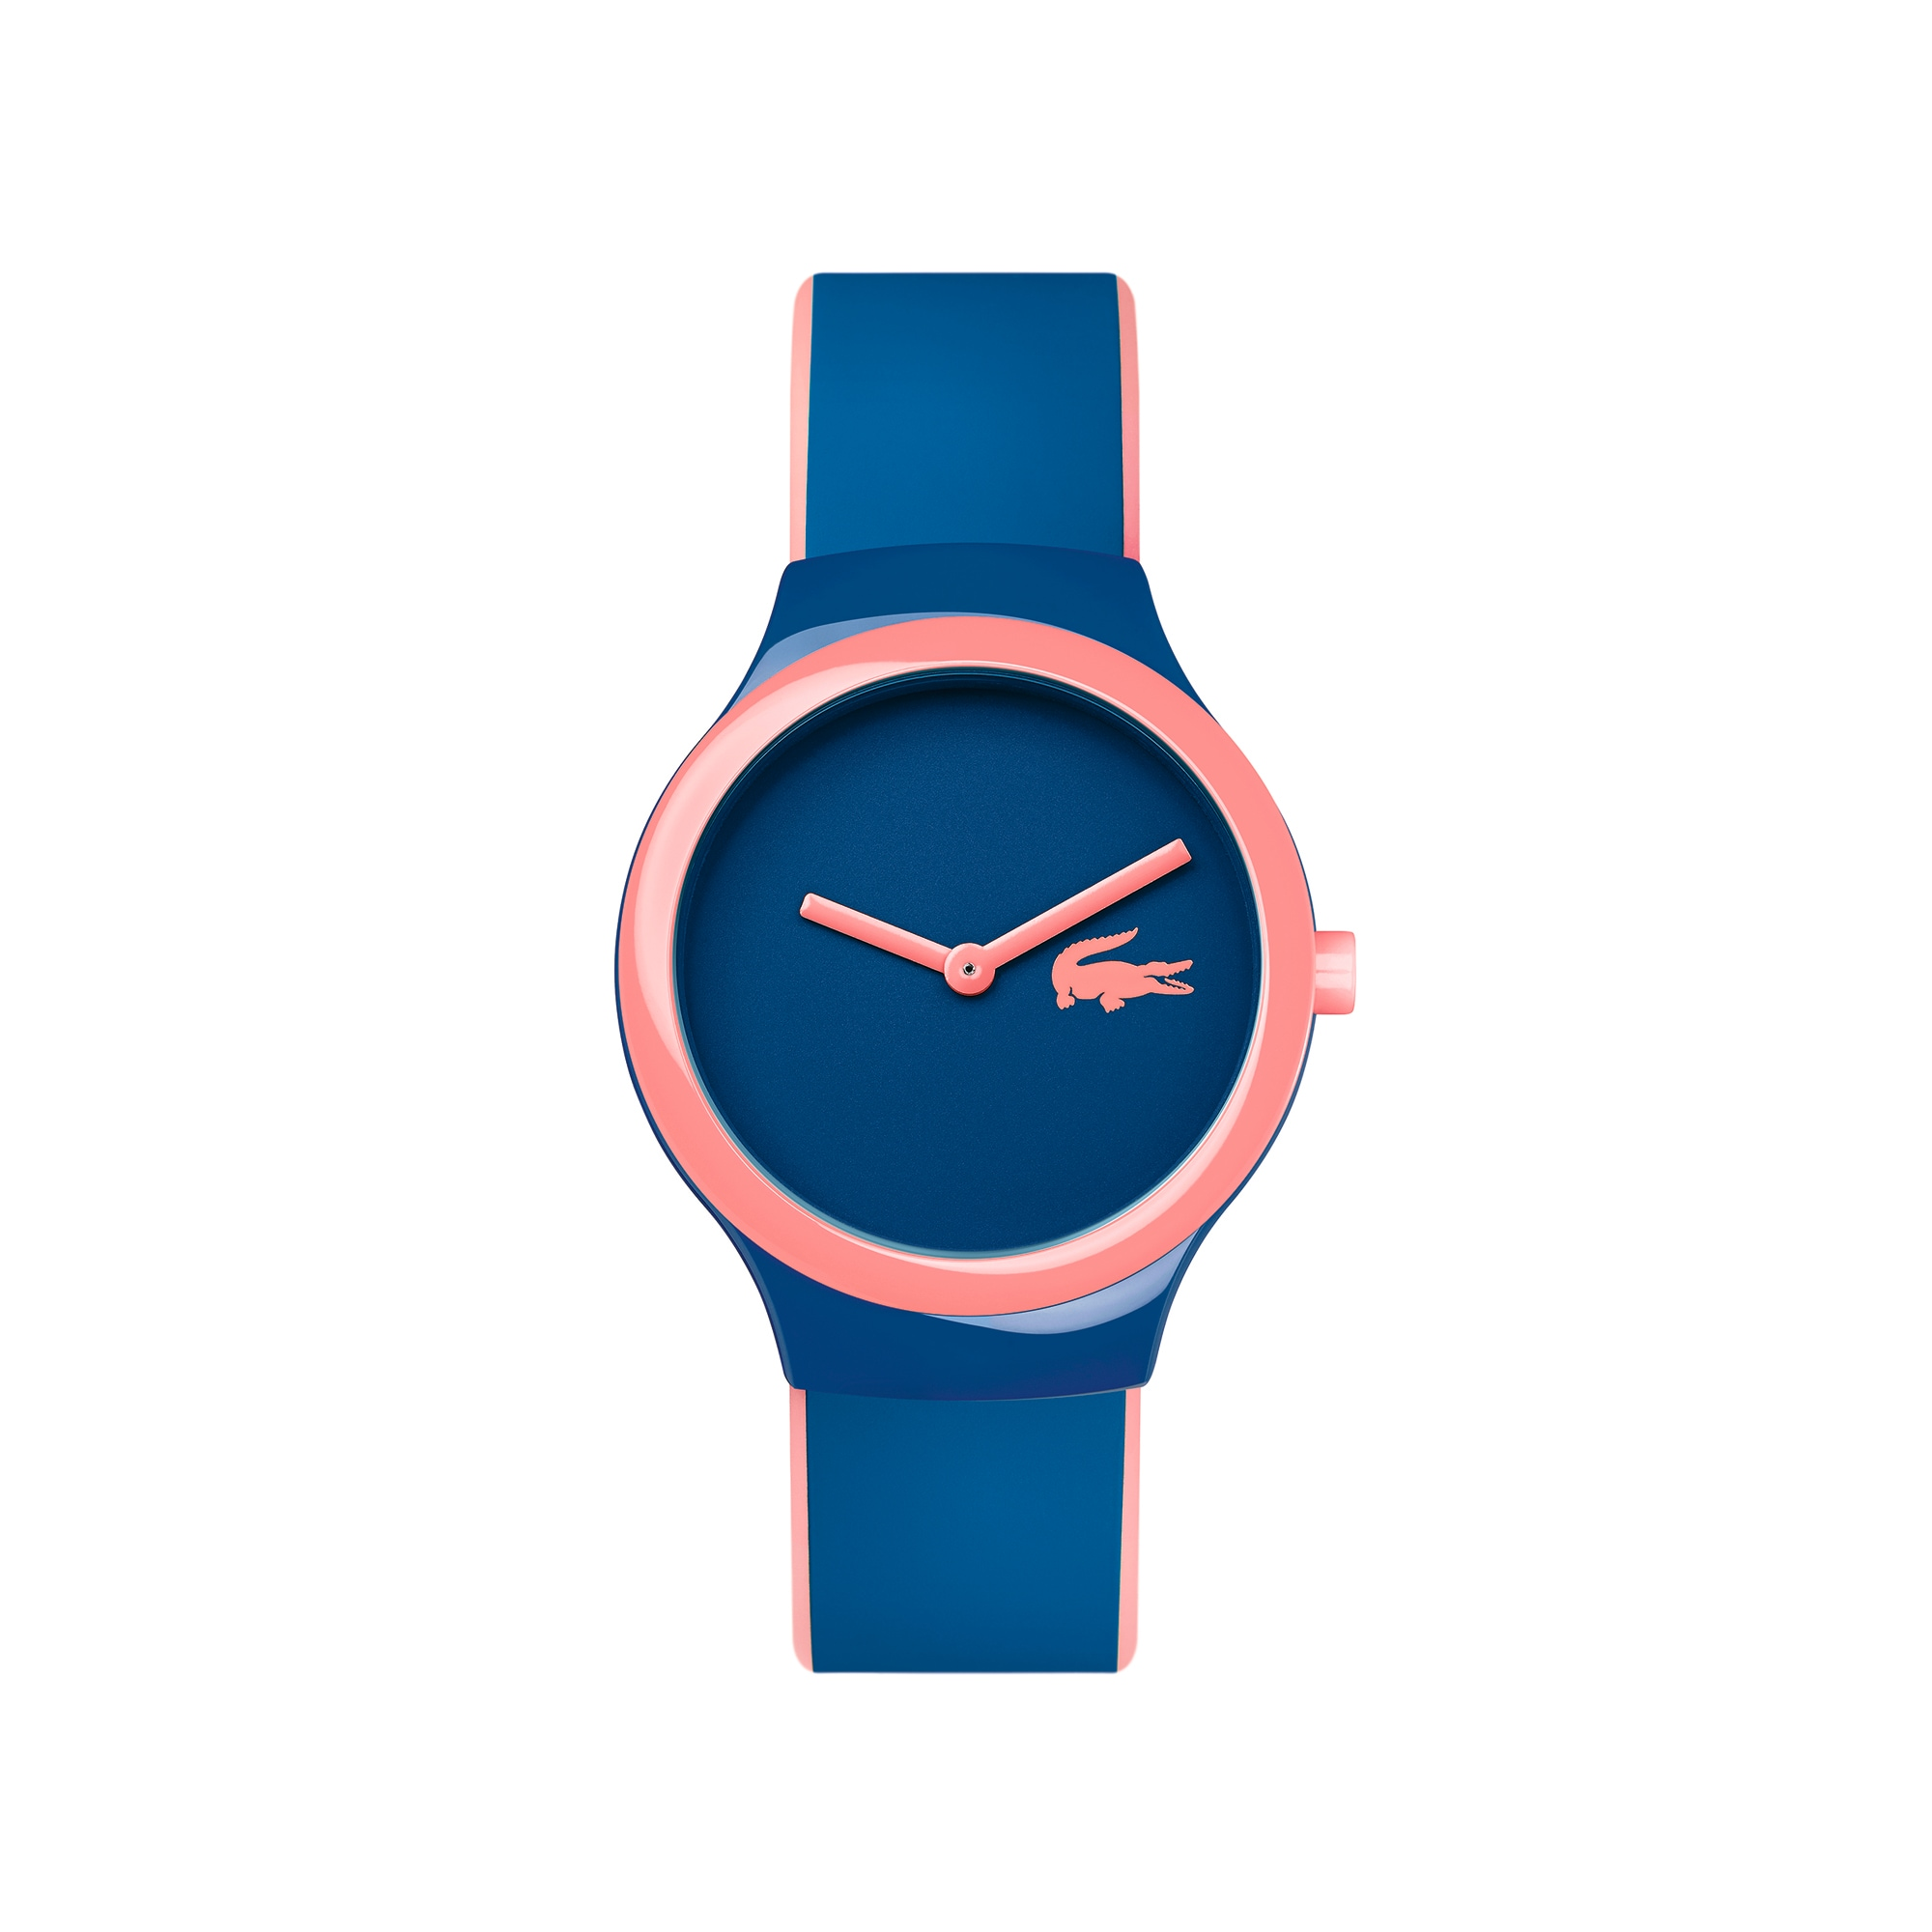 Montre Goa new bleue et rose - bracelet silicone